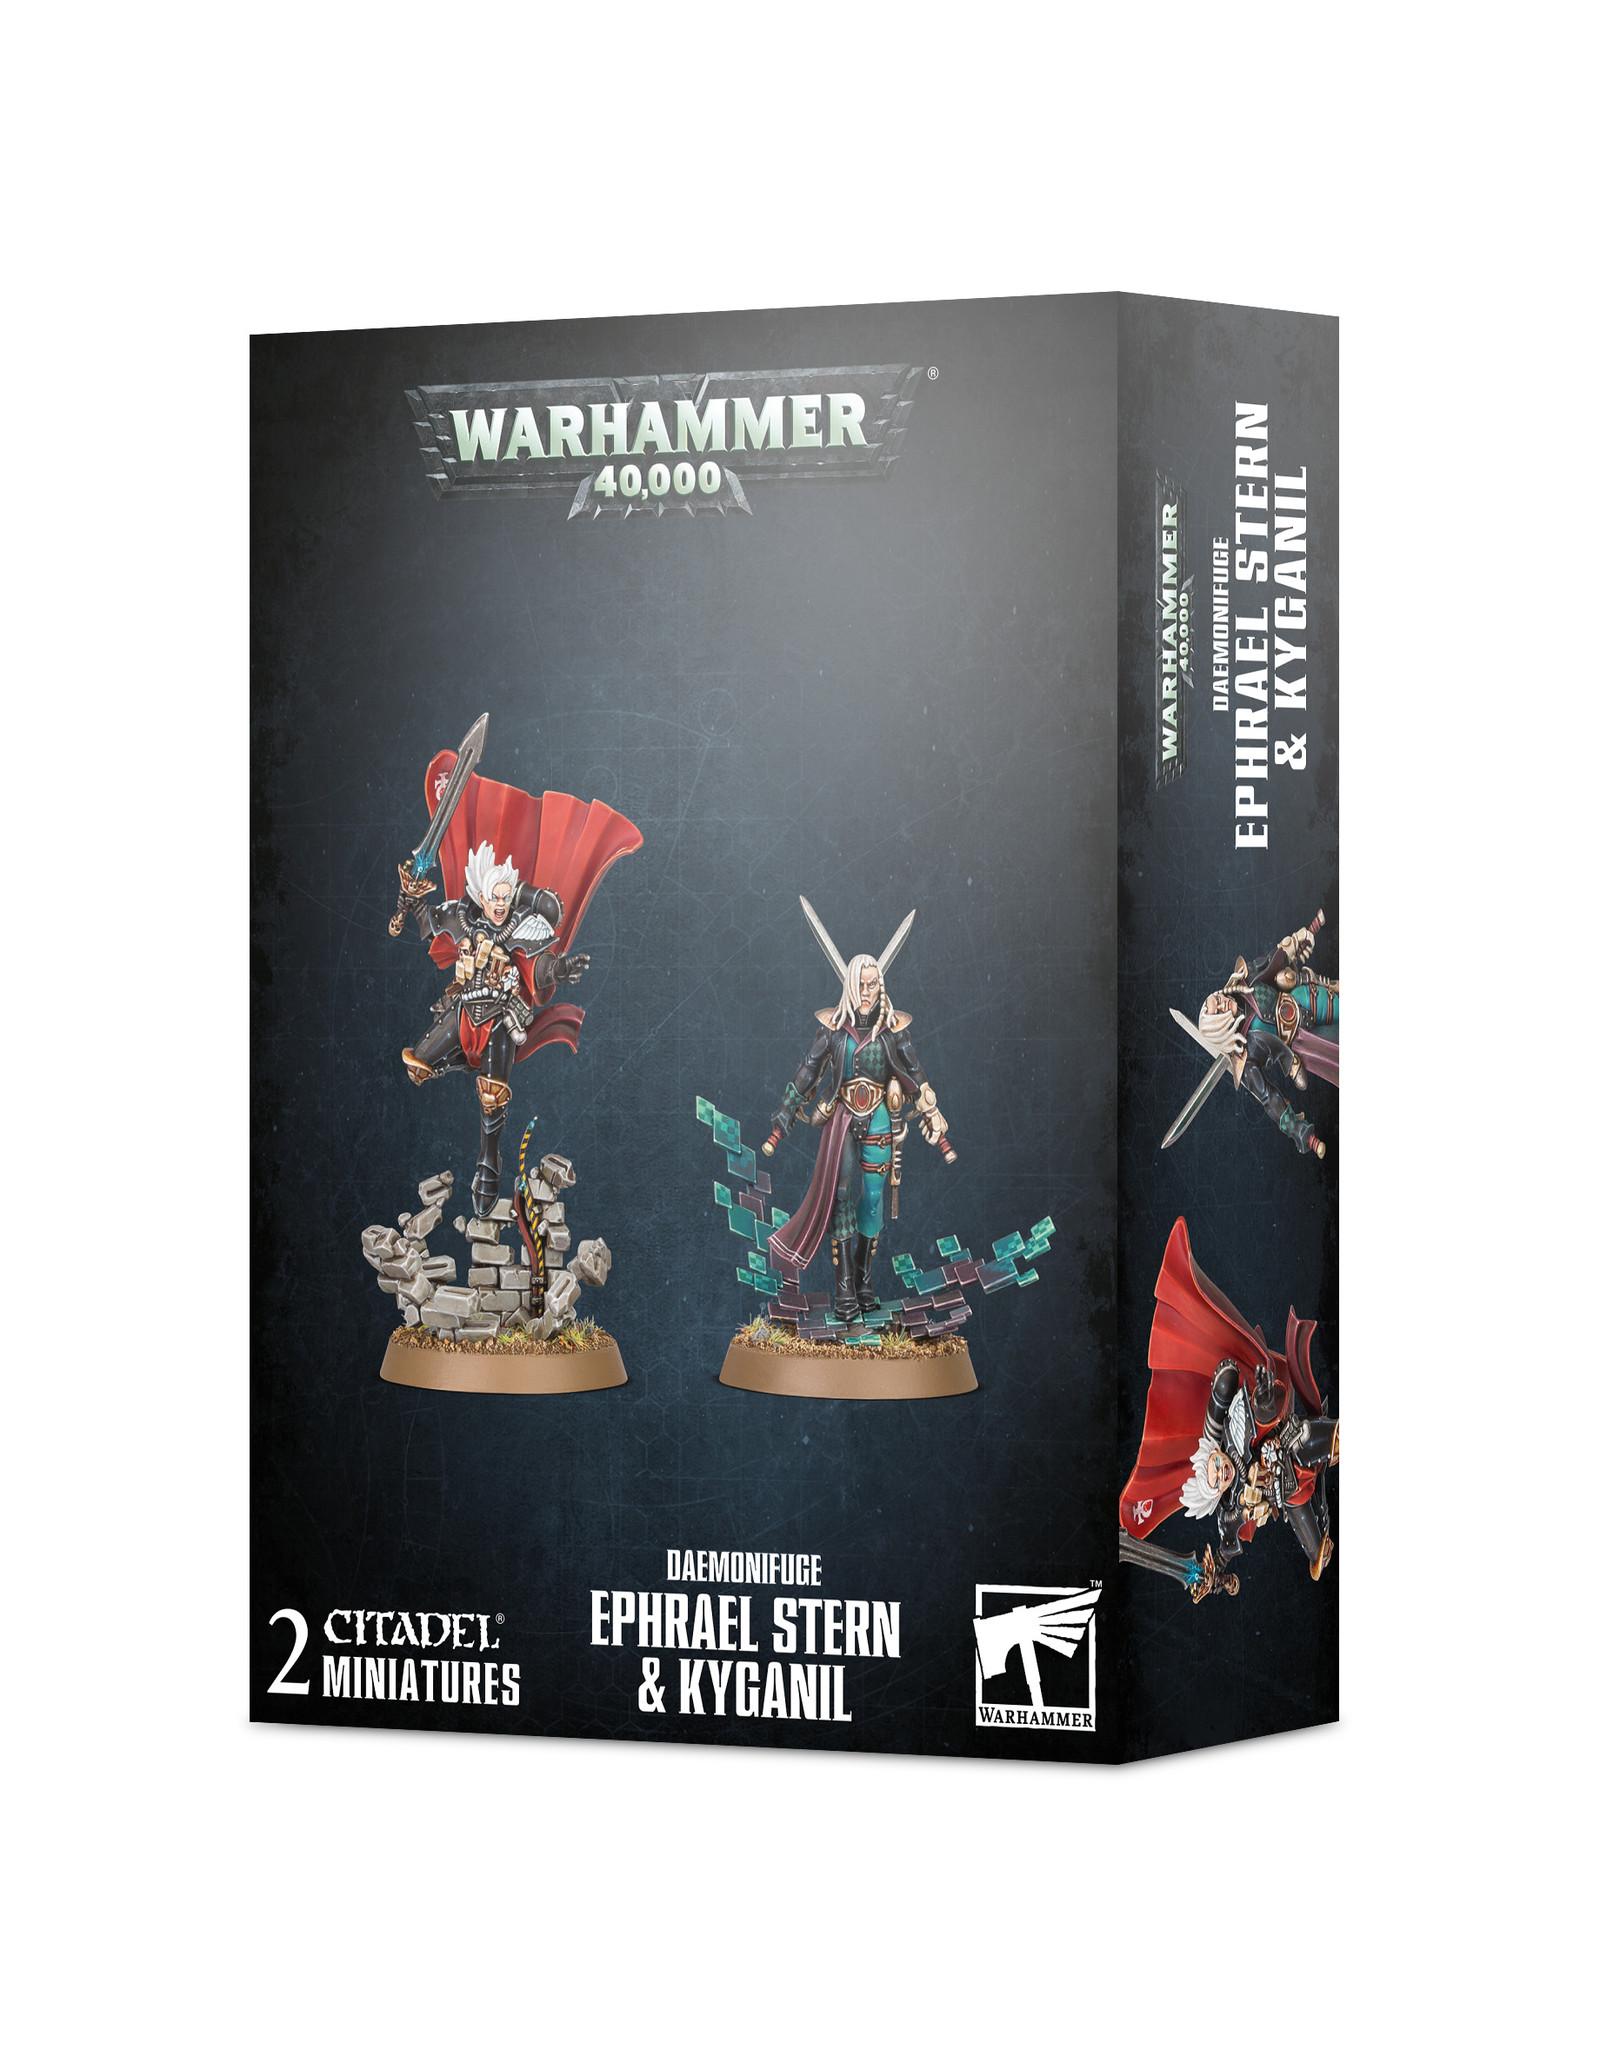 Warhammer 40K Daemonifuge Ephrael Stern & Kyganil